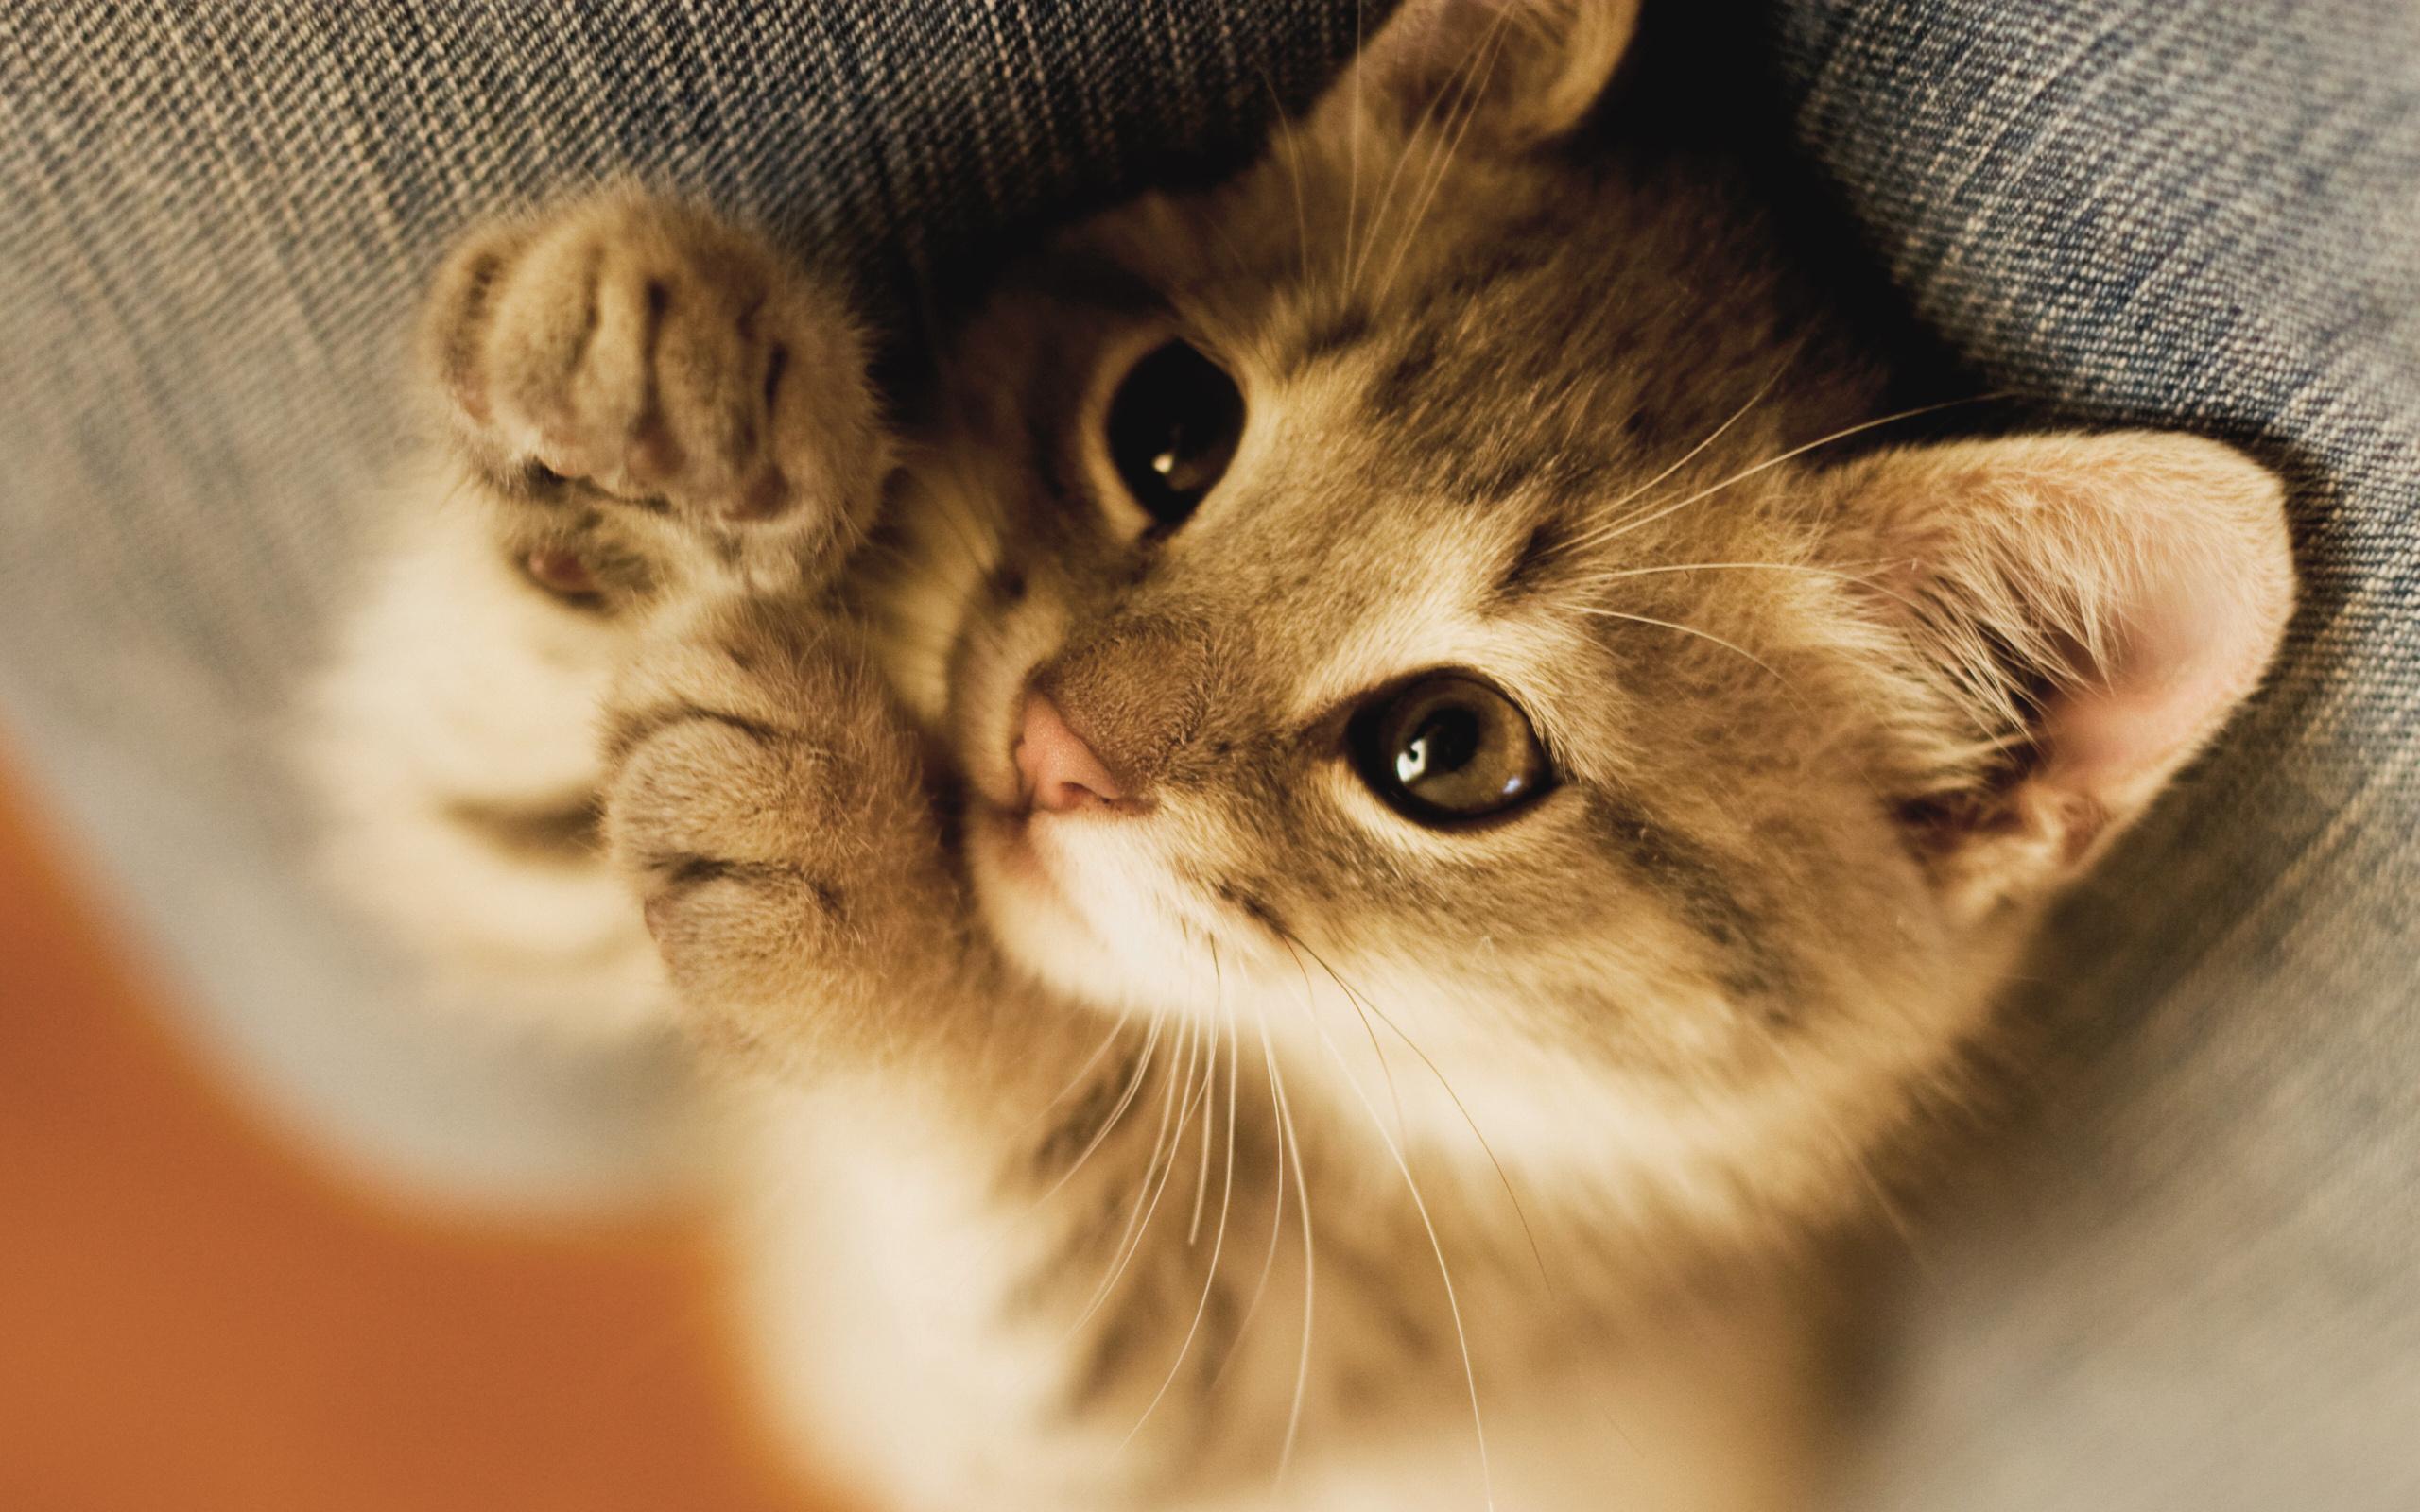 приятную картинки для планшета про котят завершил